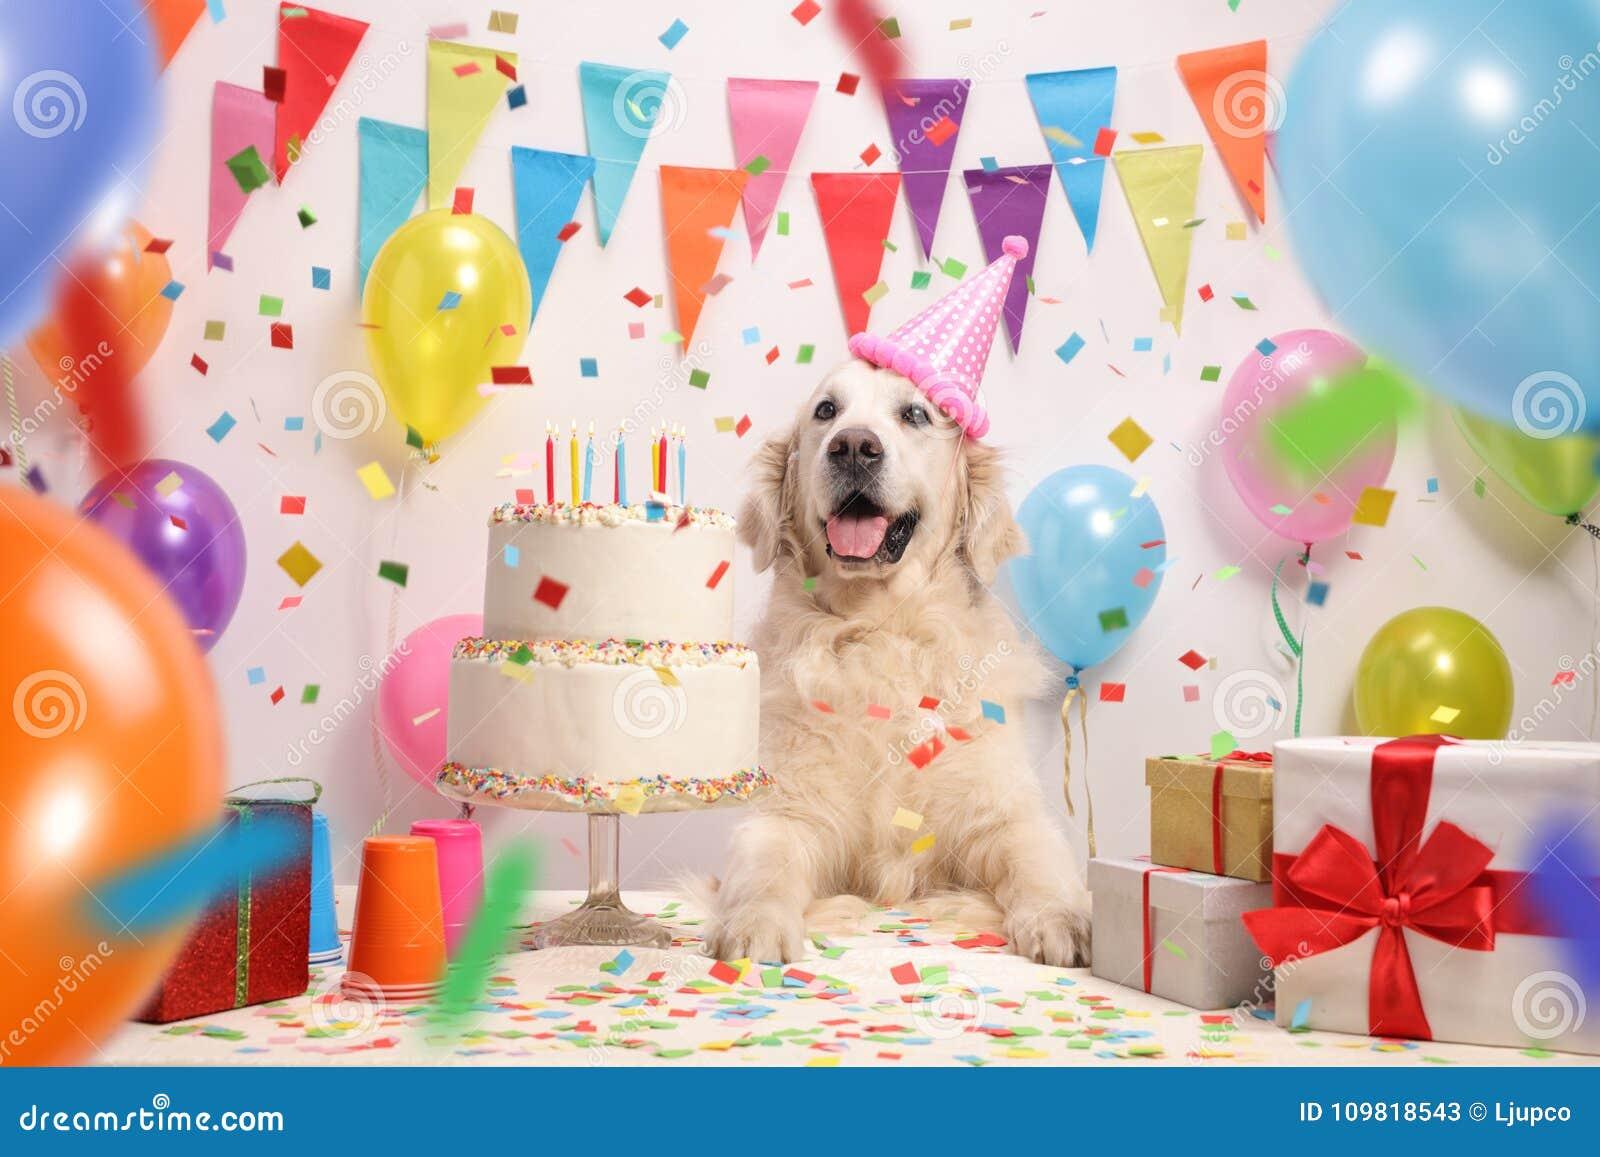 Miraculous Labrador Retriever Dog With A Birthday Cake Stock Image Image Of Funny Birthday Cards Online Alyptdamsfinfo